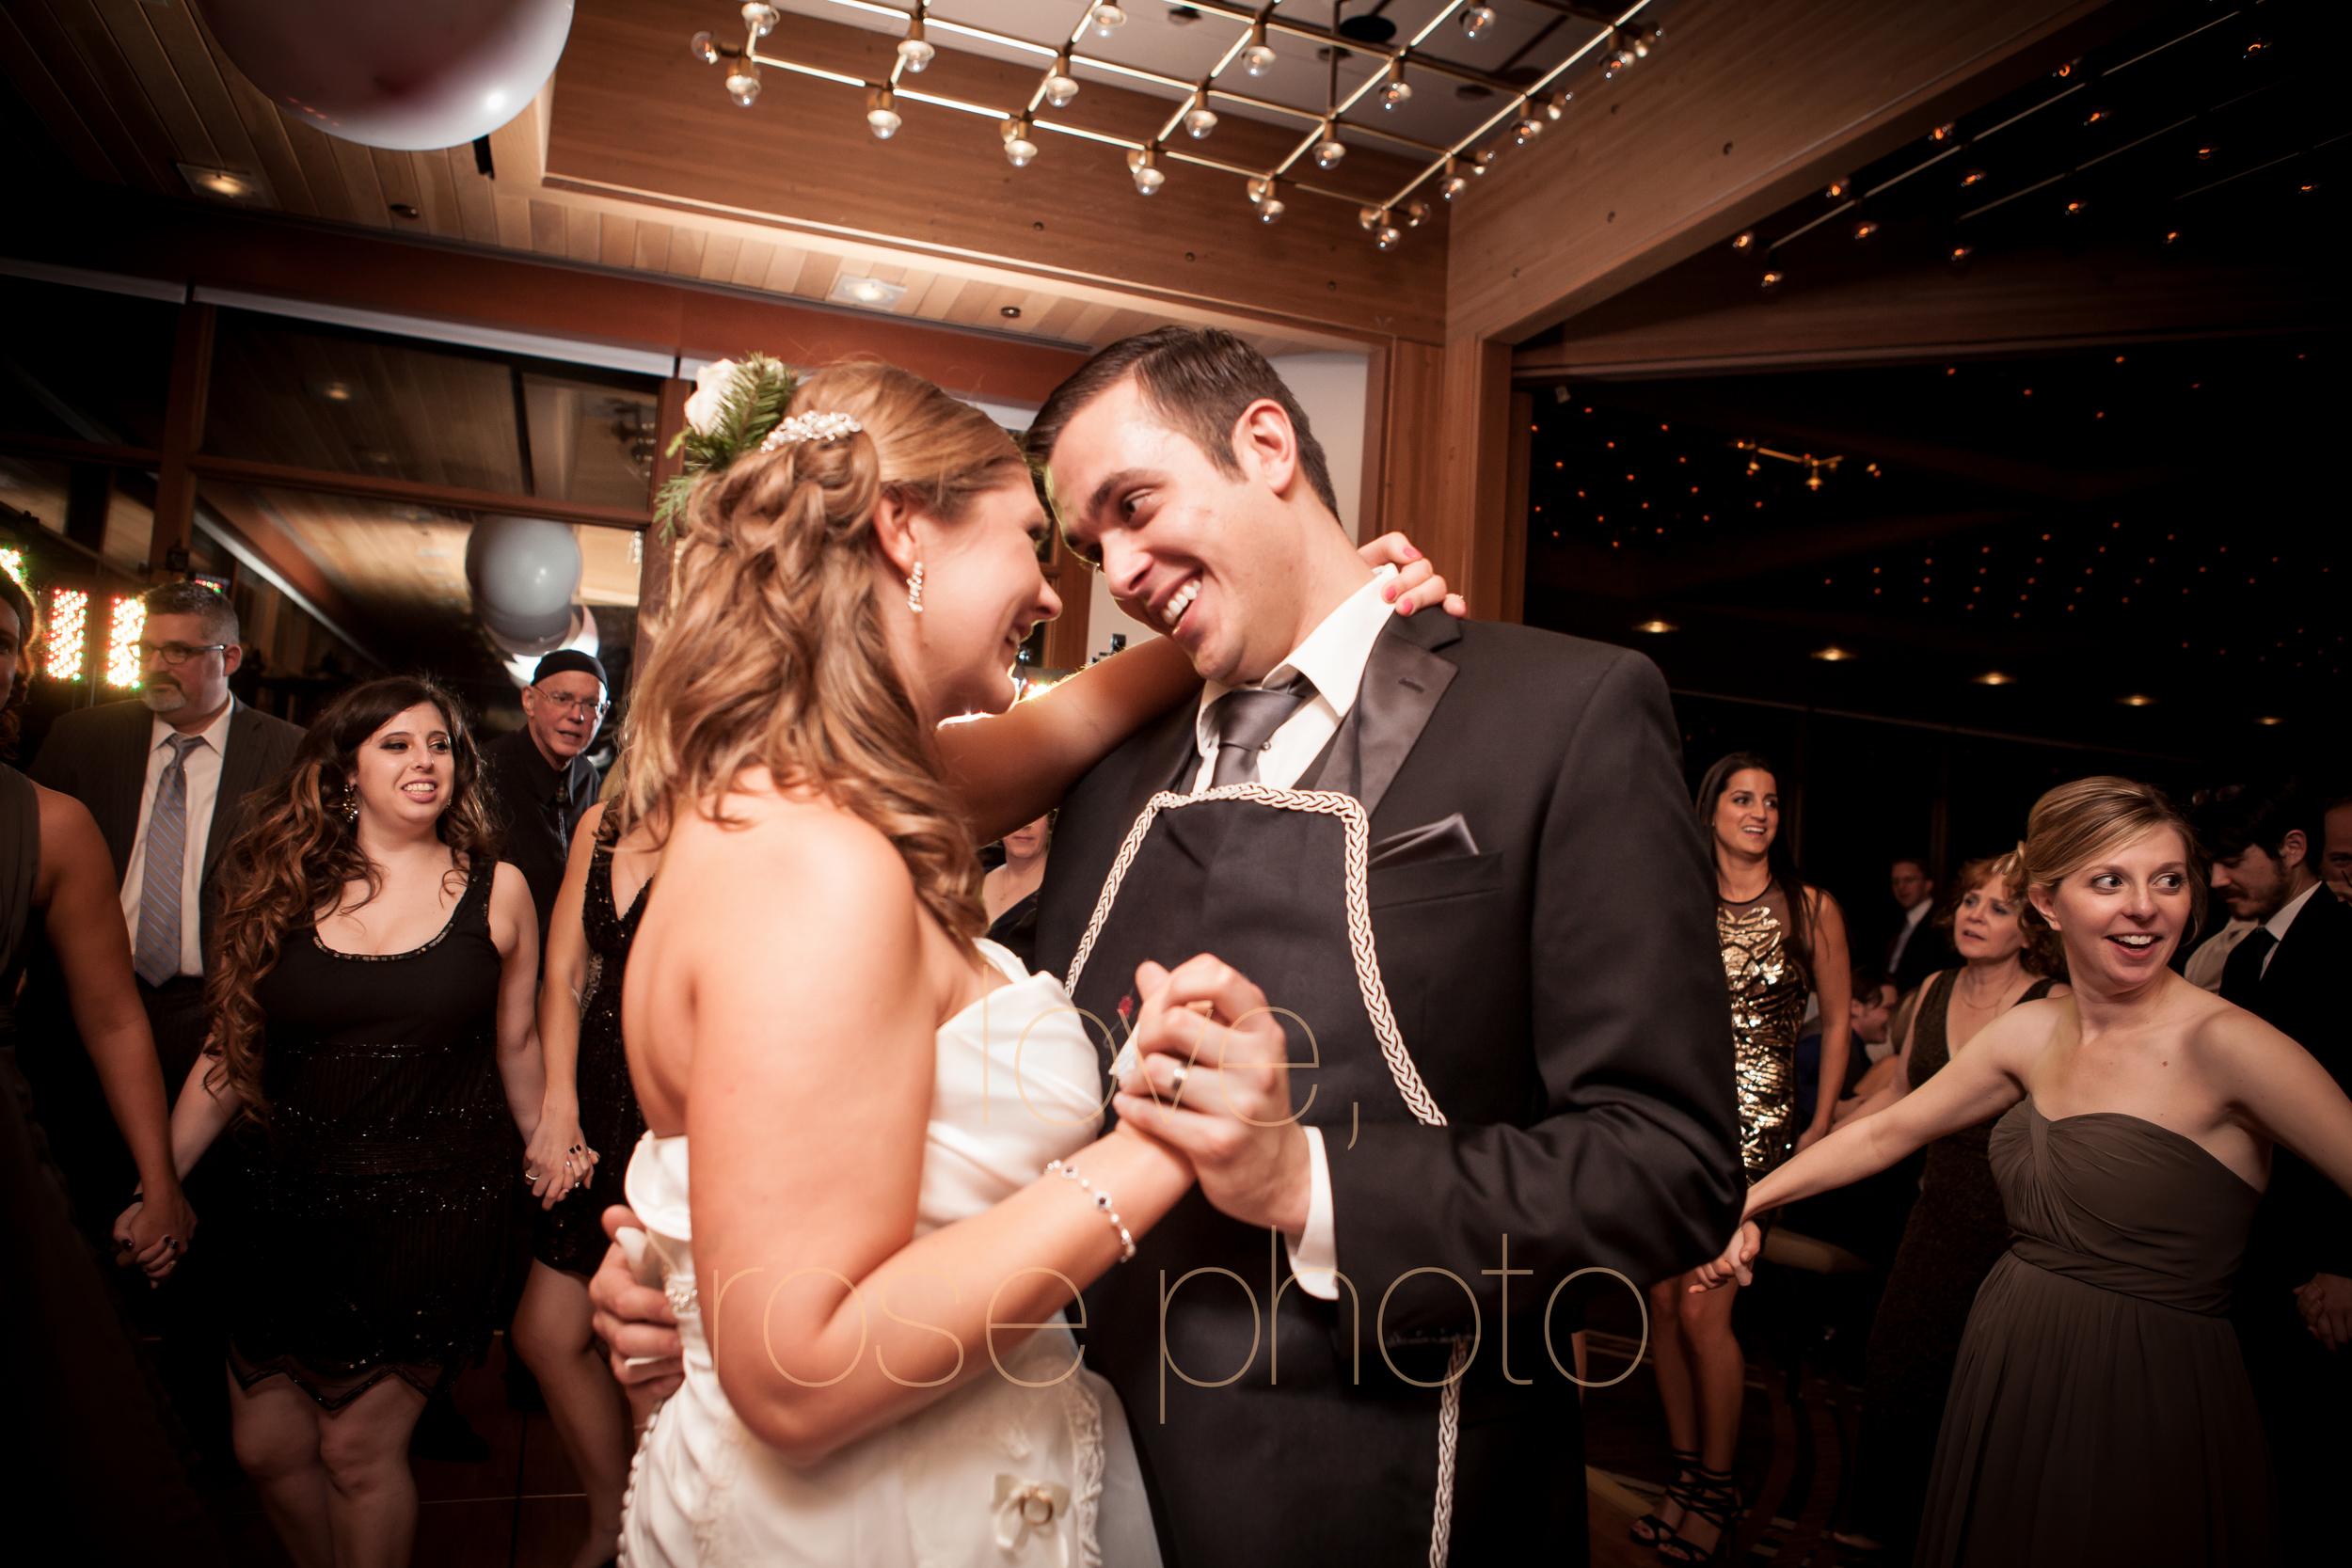 katie + even new years eve chicago oak brook mcdonalds lodge 2014 polish wedding balloon drop champagne-017.jpg